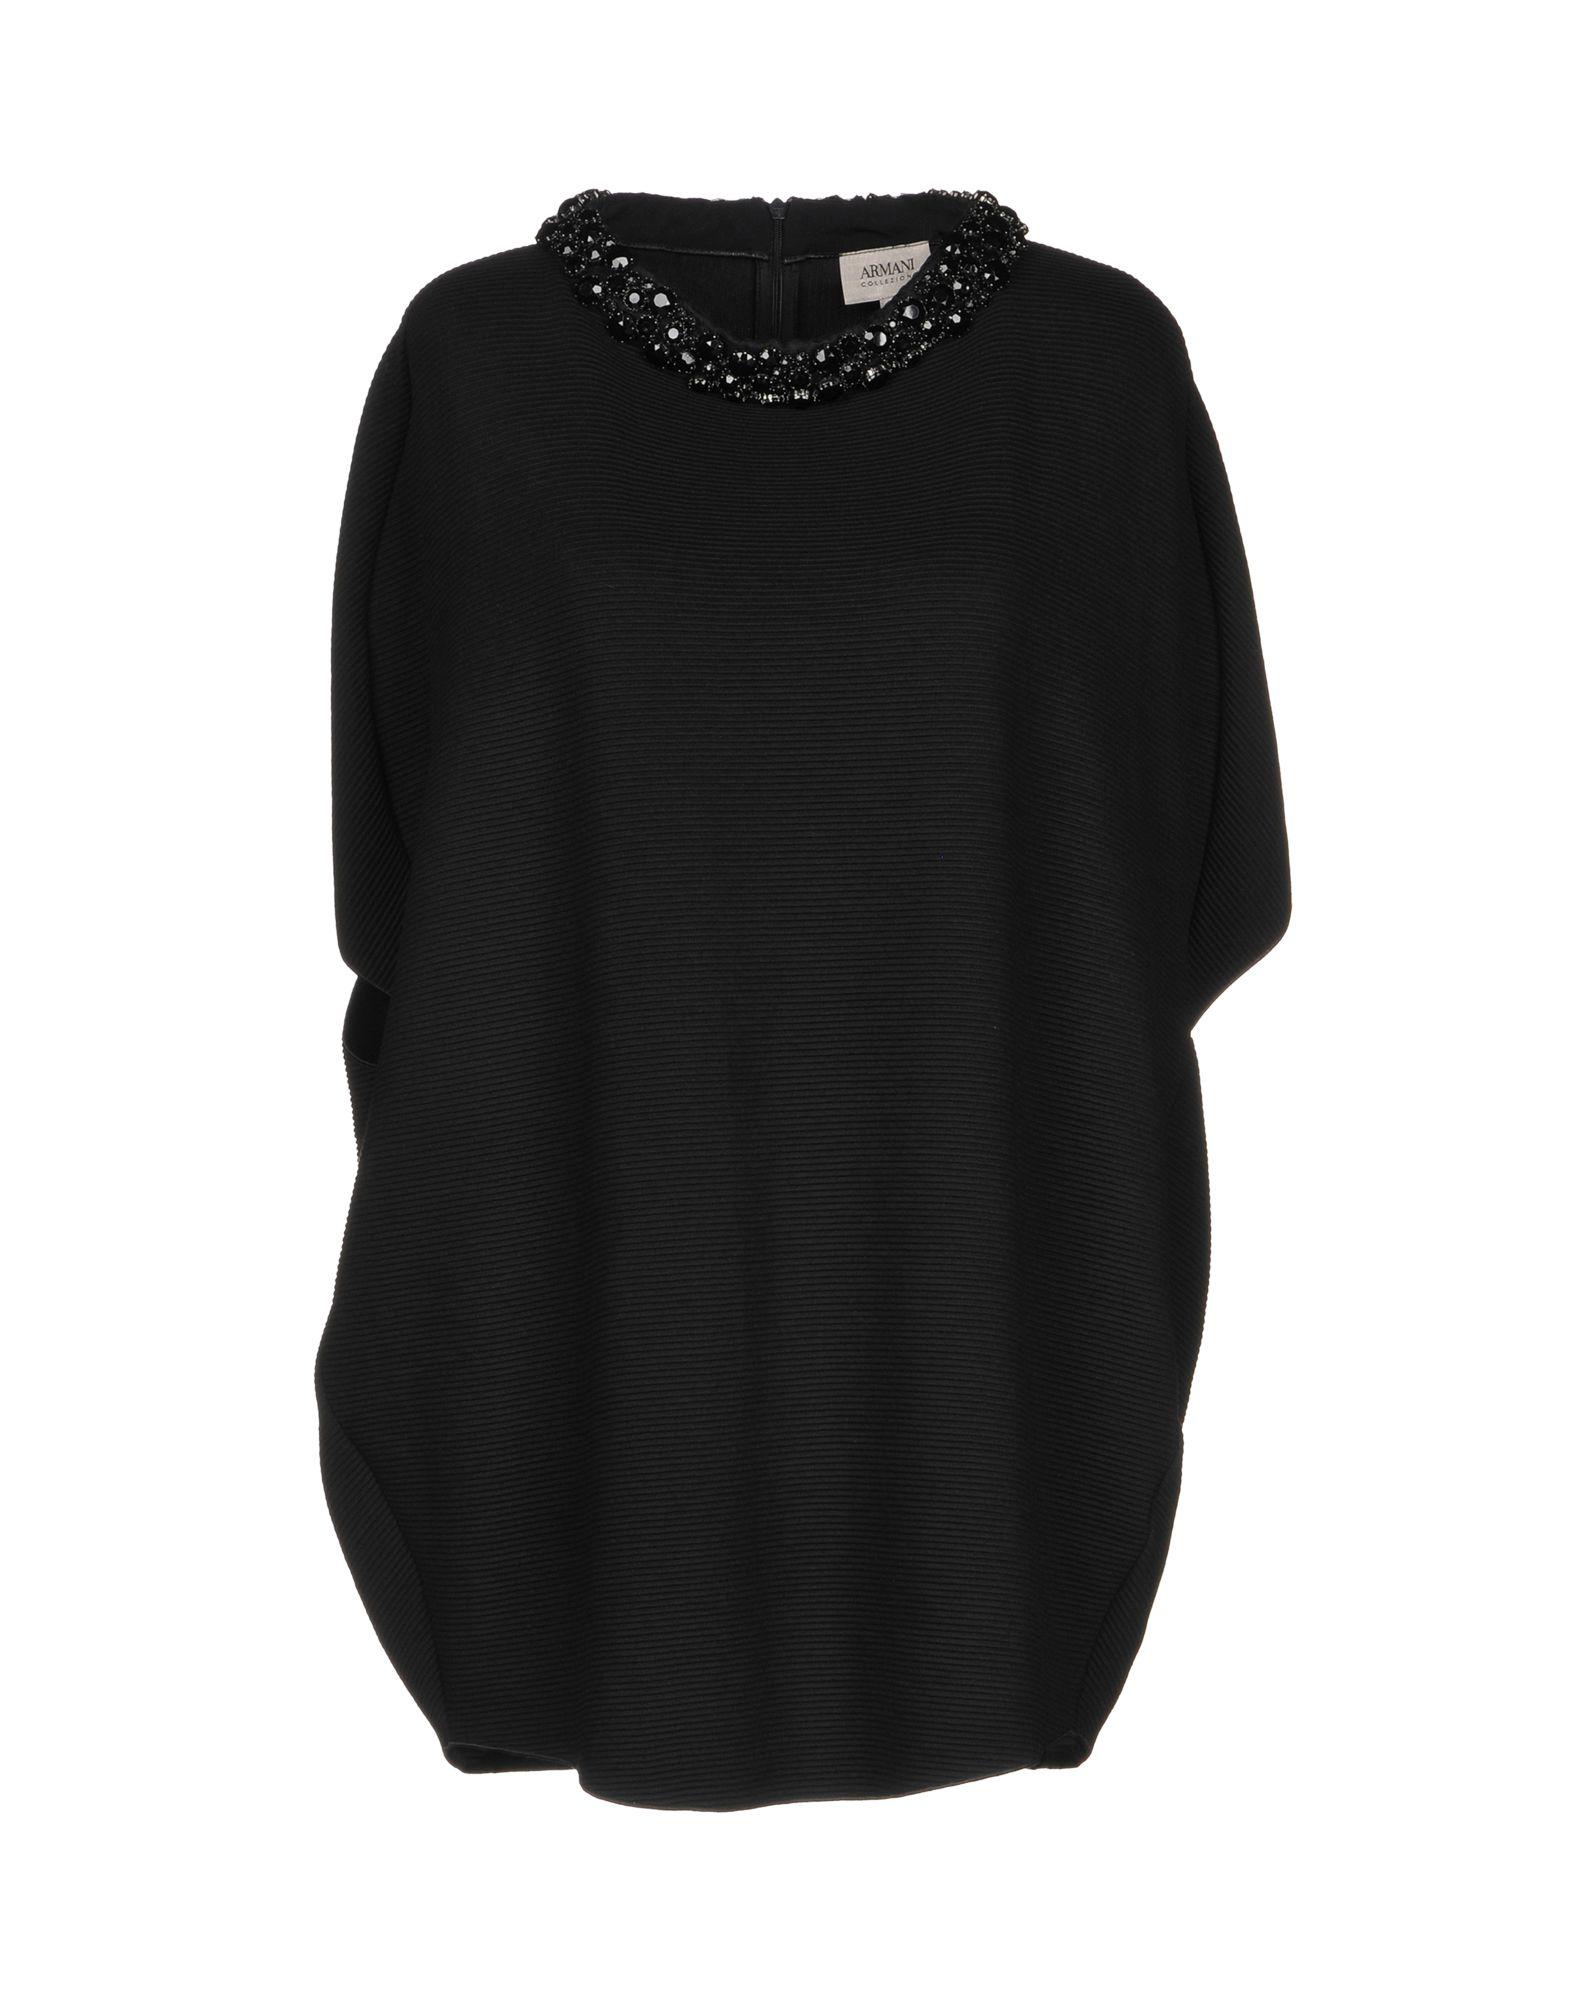 ARMANI COLLEZIONI Блузка пуловер armani collezioni джемперы свитера и пуловеры короткие